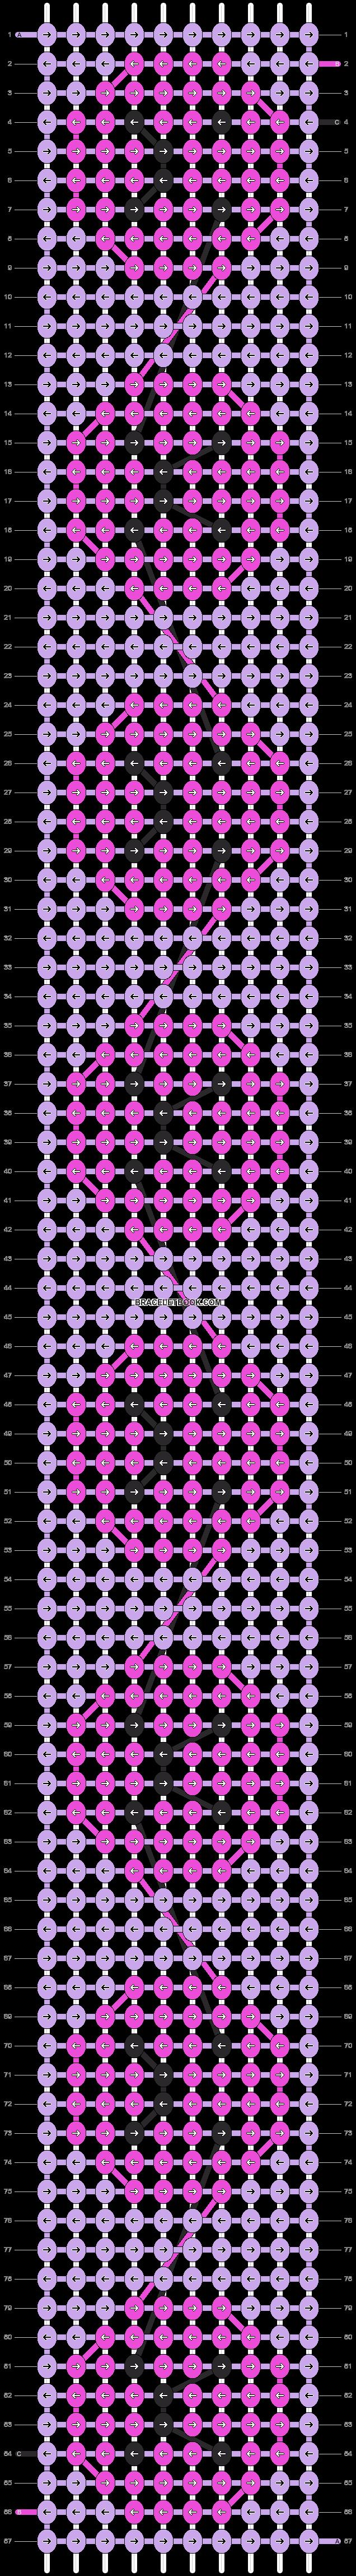 Alpha pattern #86854 variation #157027 pattern